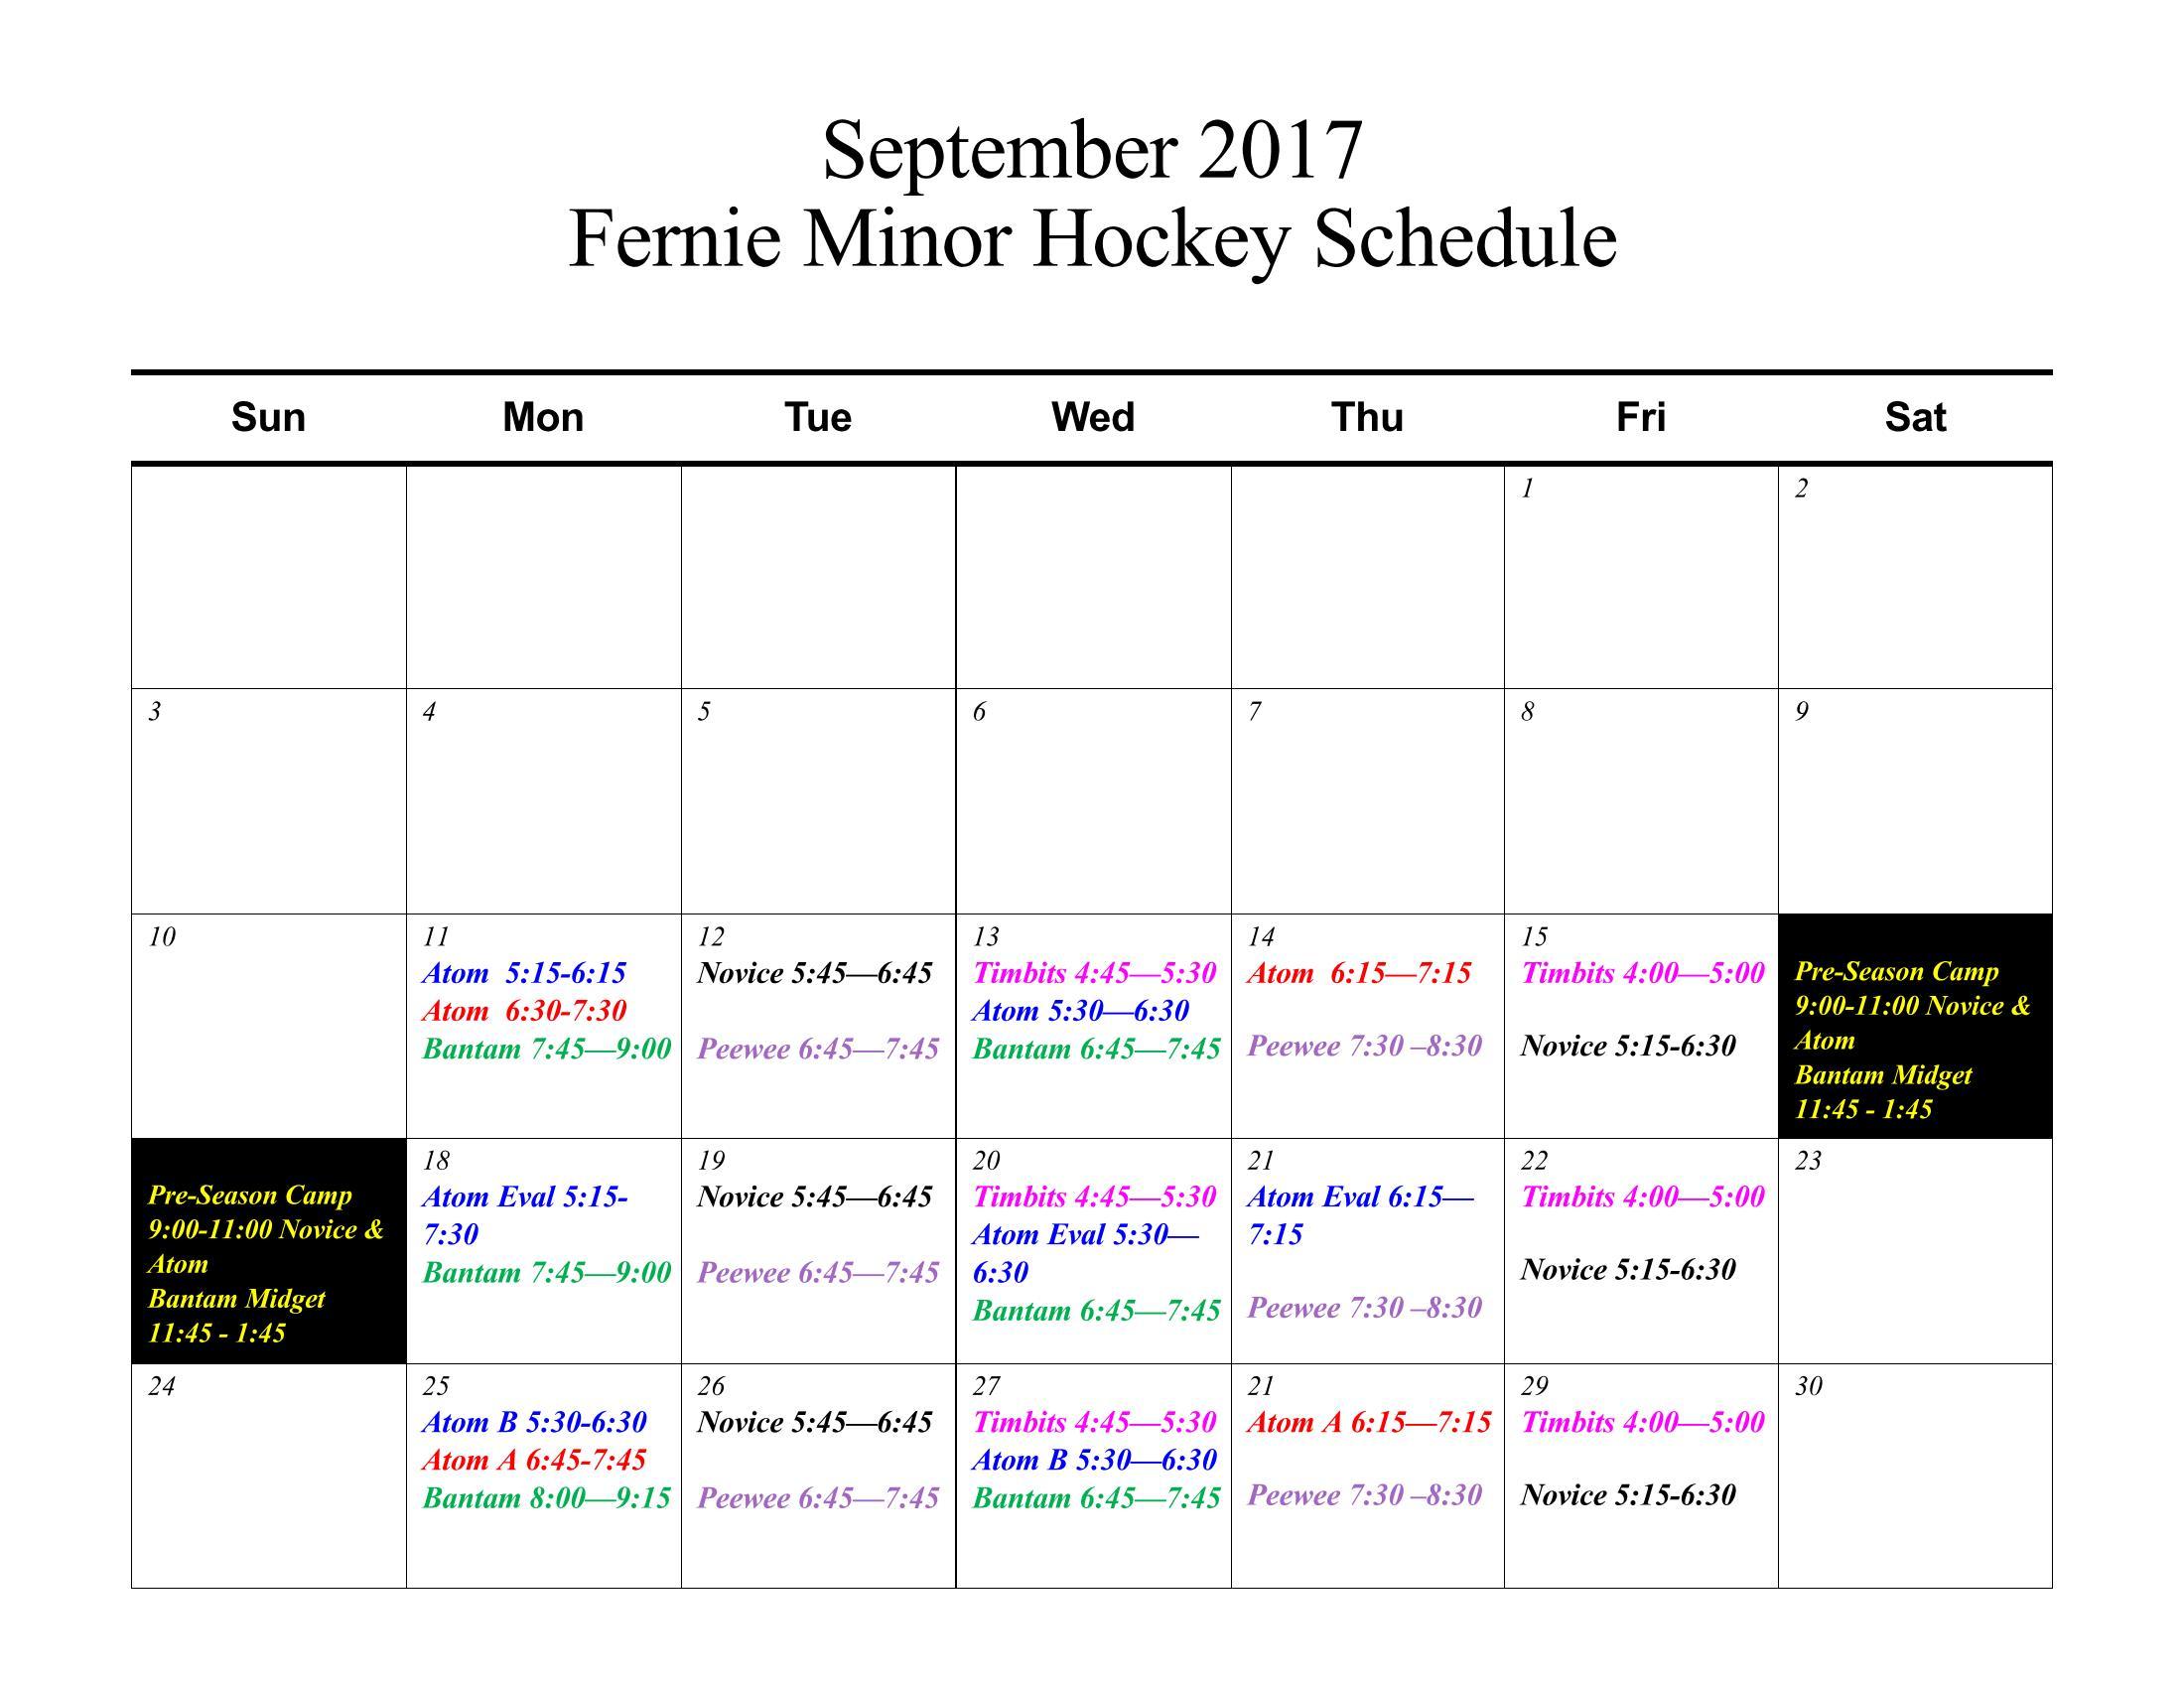 2017/18 Ice Schedule